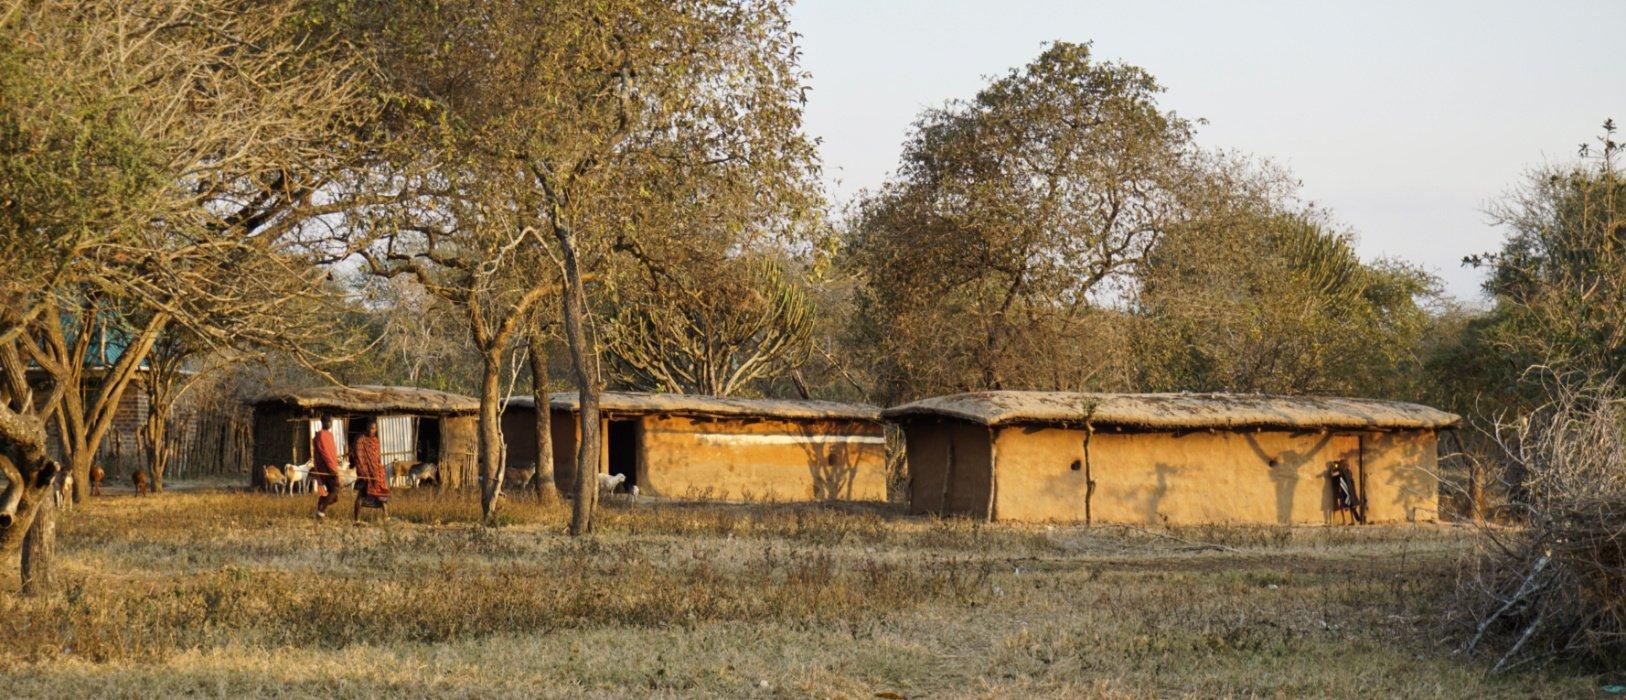 Boma in the bush, Manyara region, Tanzania - Experiencing The Globe